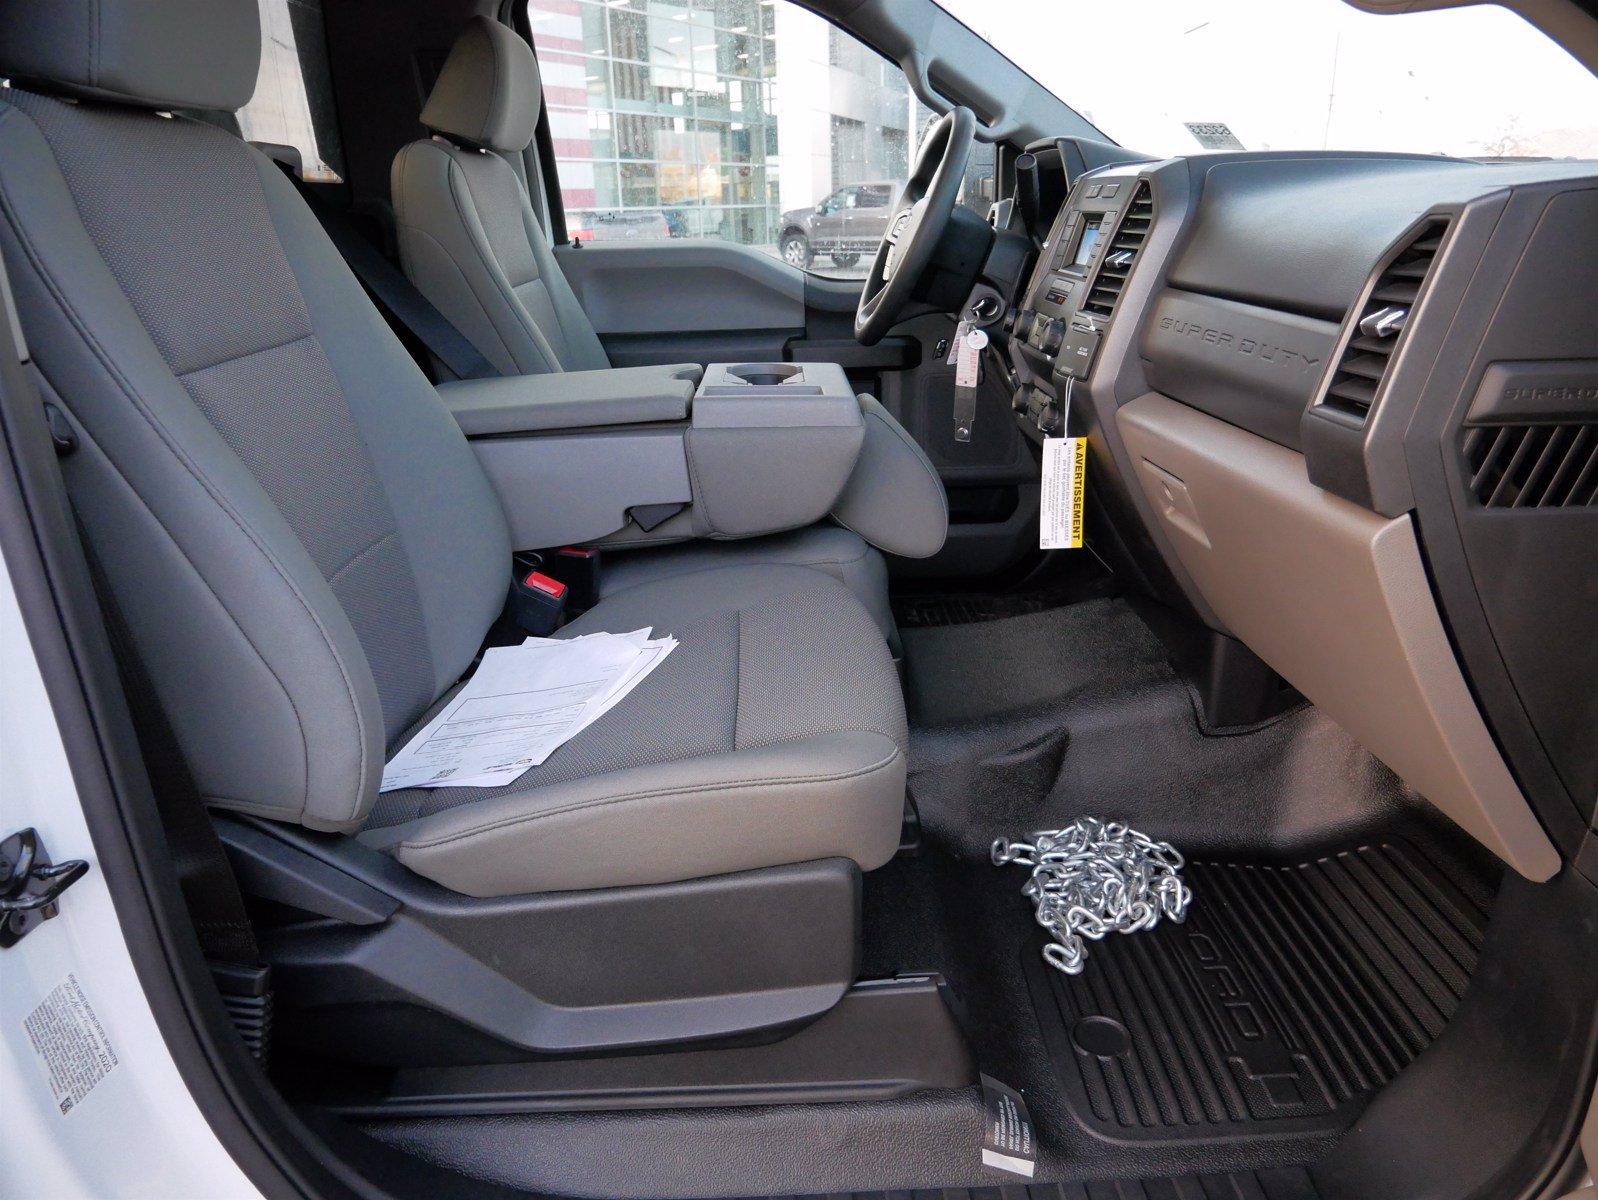 2020 Ford F-550 Regular Cab DRW 4x4, Scelzi Dump Body #63233 - photo 22